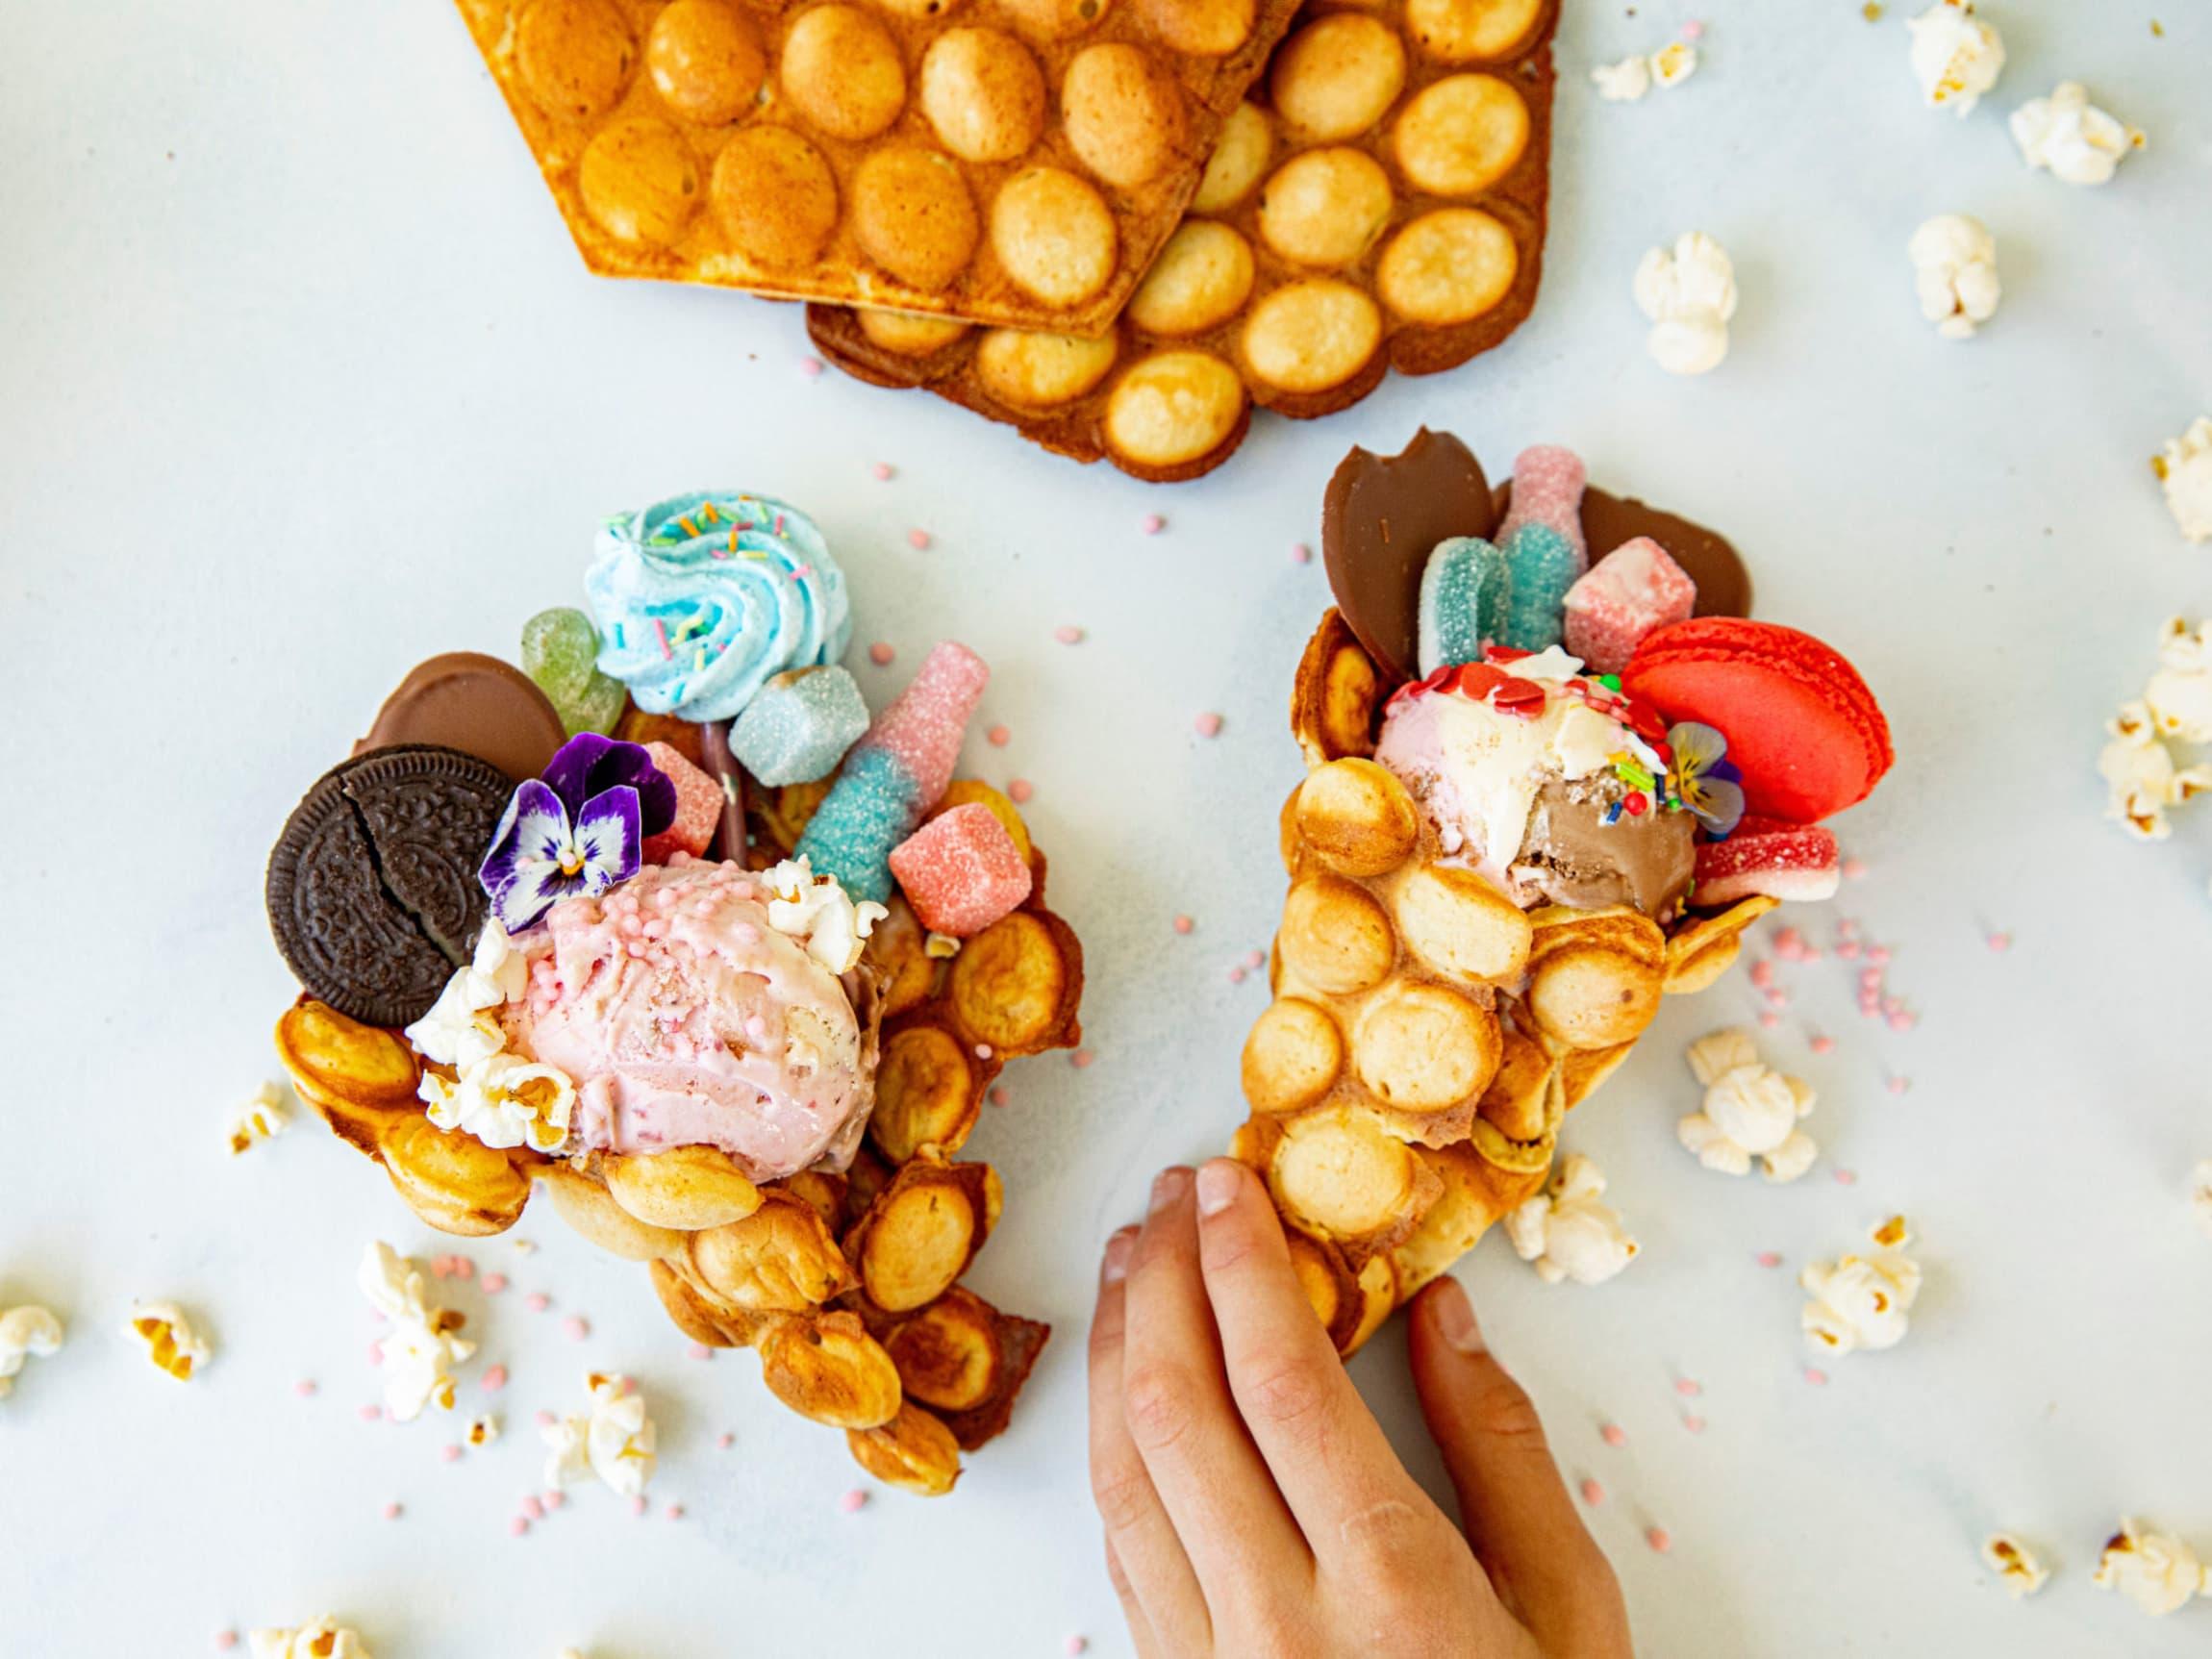 Barnas favoritt - vaffel, is og godis!